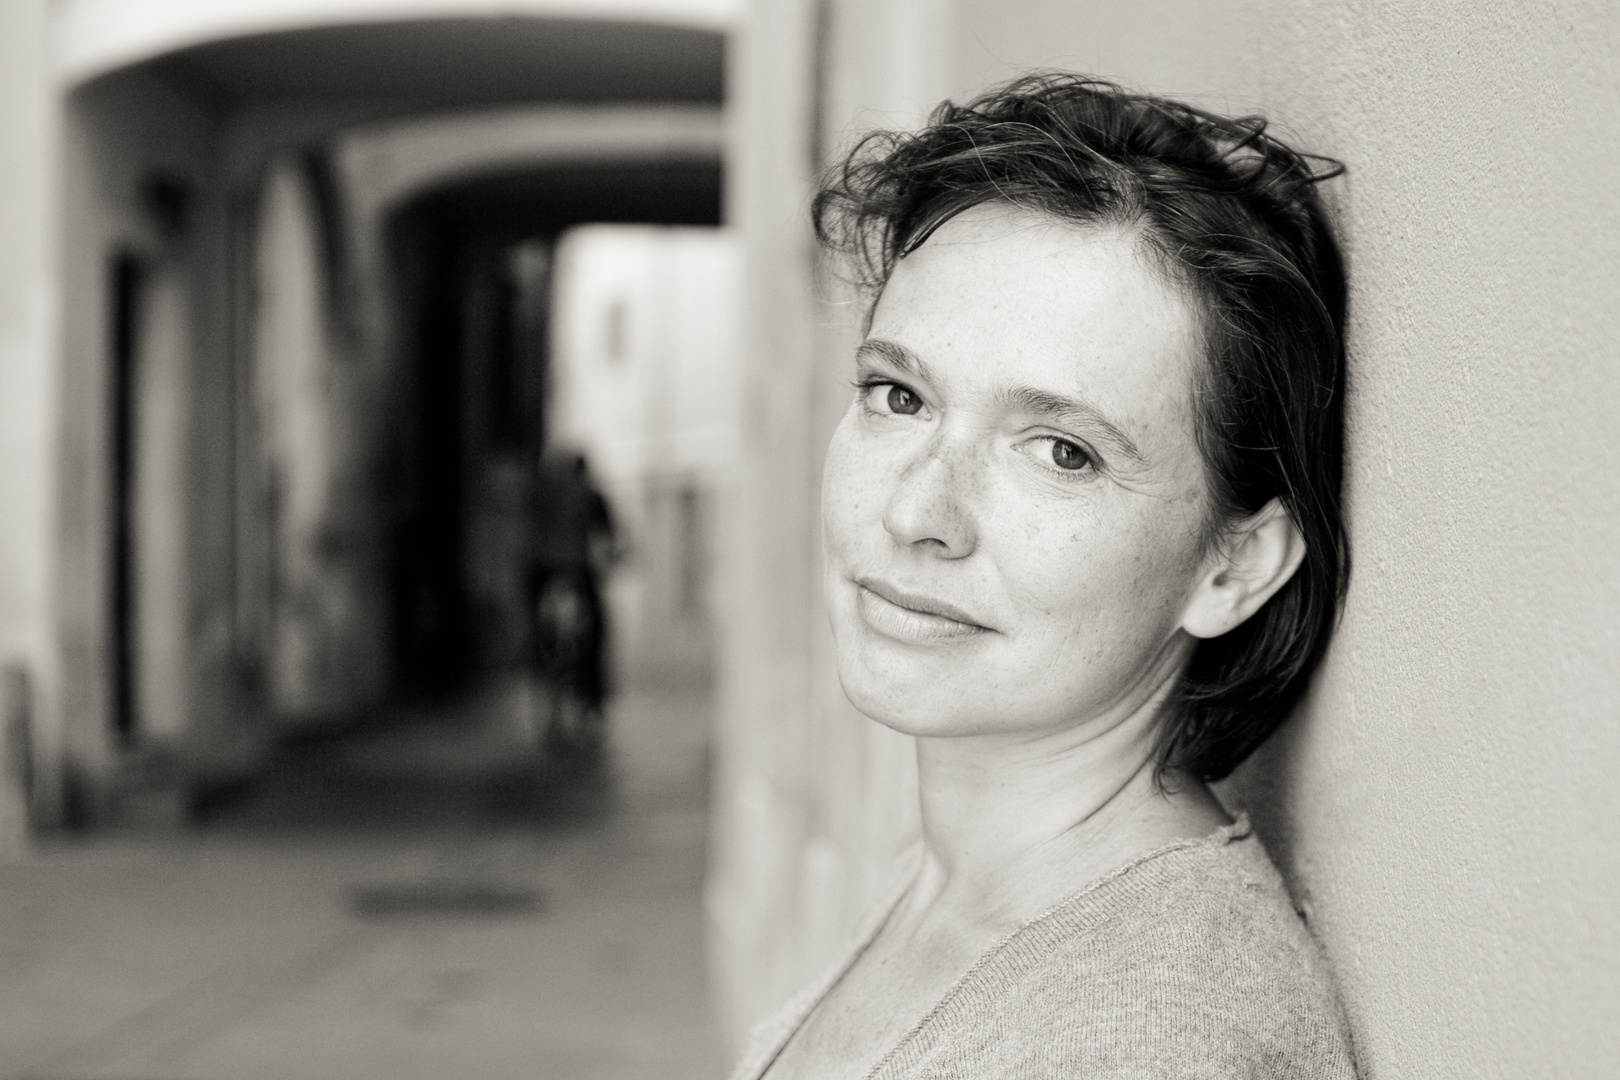 Amanda Langlet